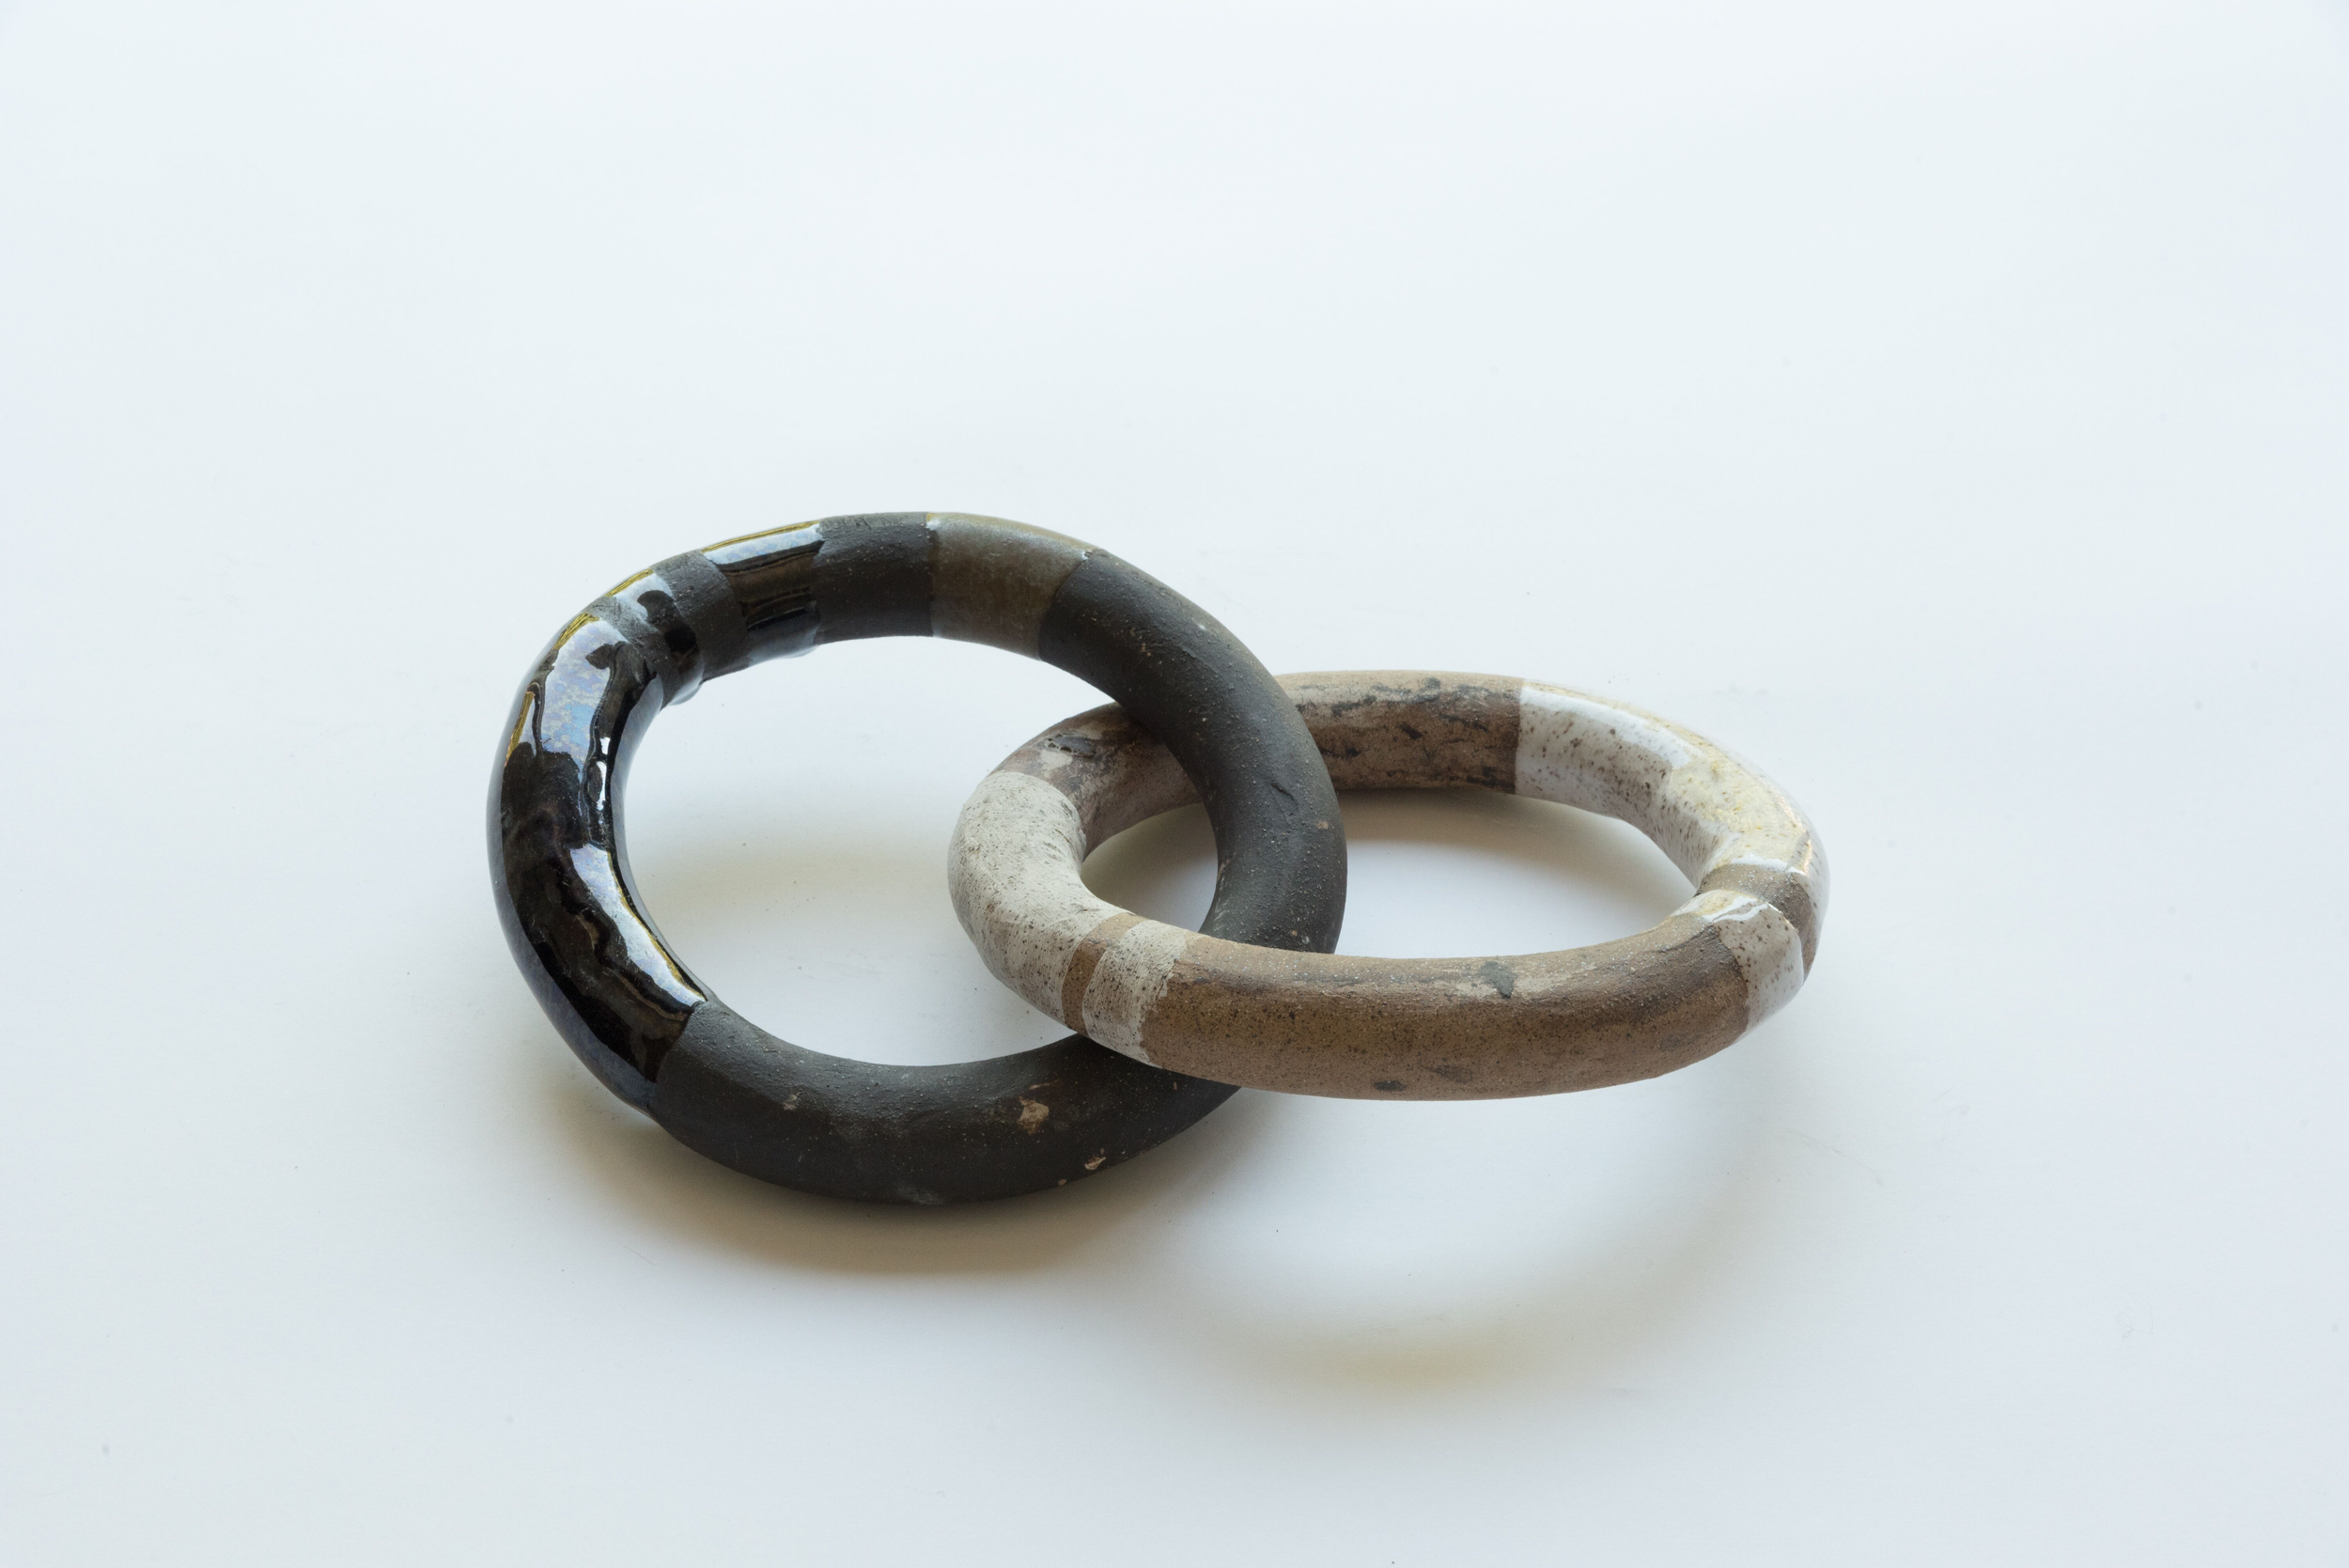 Ceramic Chain (2 Links)